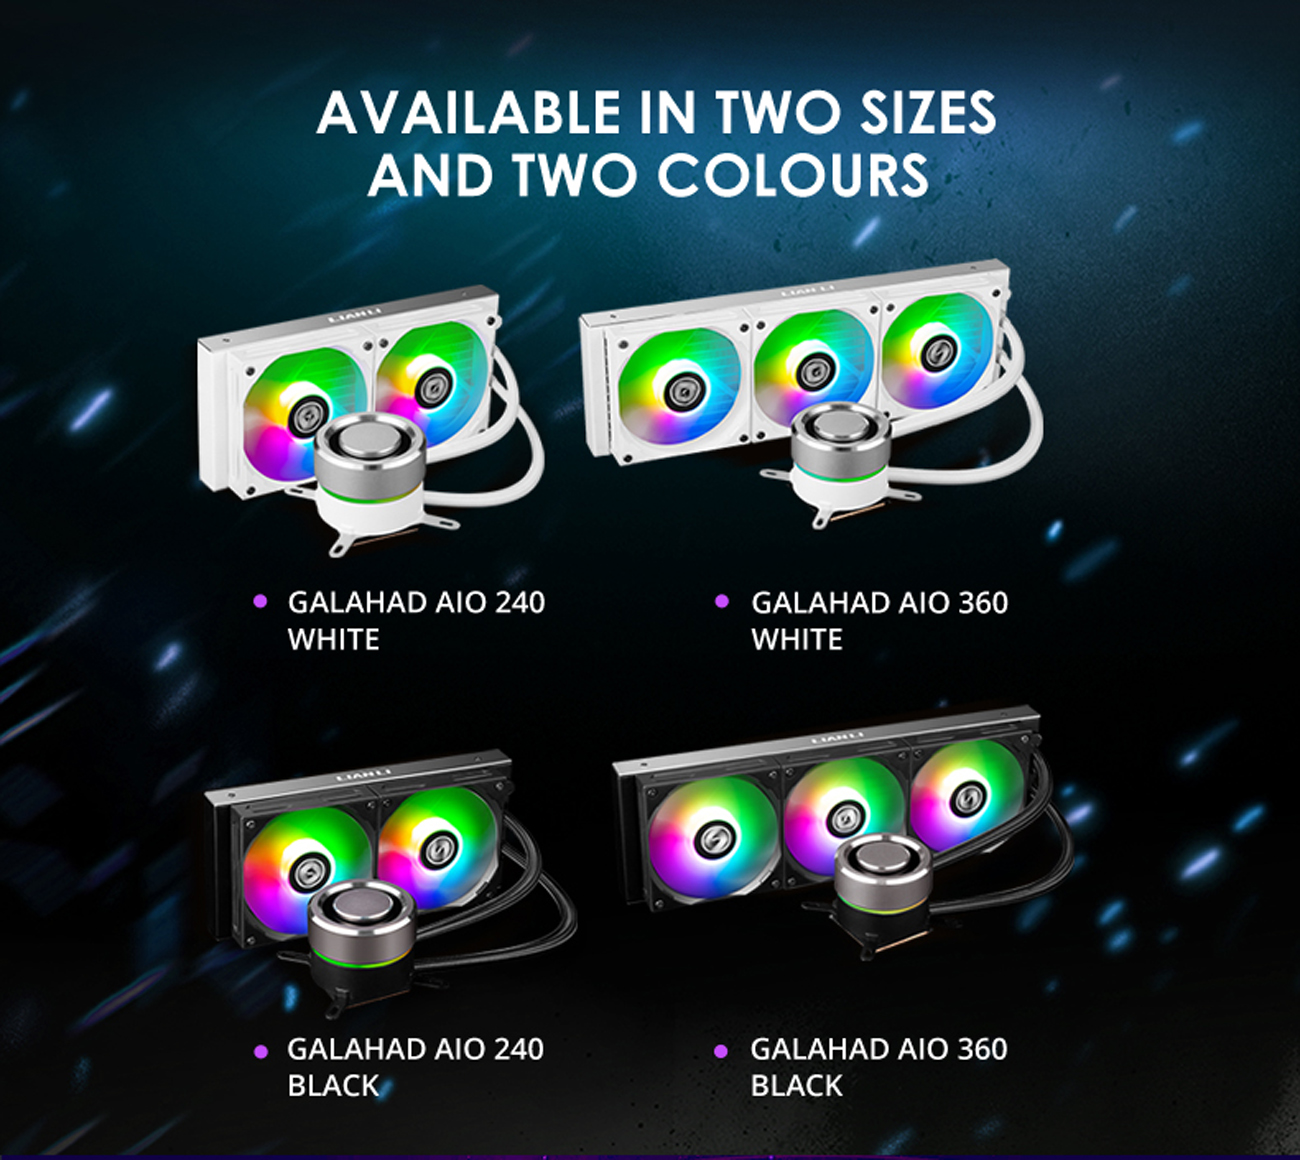 LIAN LI GALAHAD AIO240 RGB BLACK, Dual 120mm Addressable RGB Fans AIO CPU  Liquid Cooler - Newegg.com